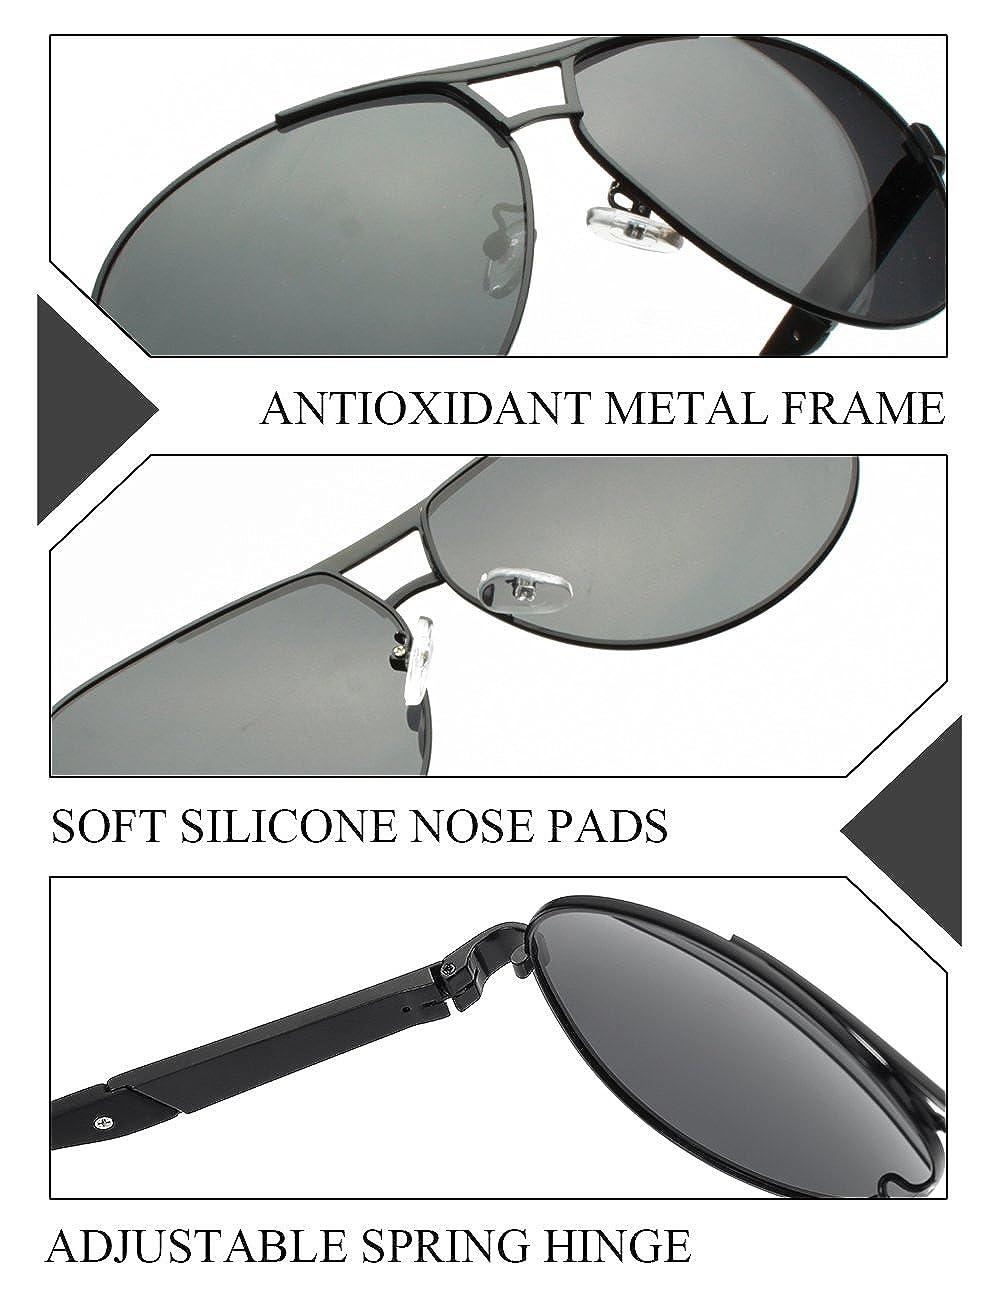 81ca6da297 Amazon.com  WELUK Oversized Mens Aviator Sunglasses Polarized 63mm Driving  UV400 Protection (Black   Grey